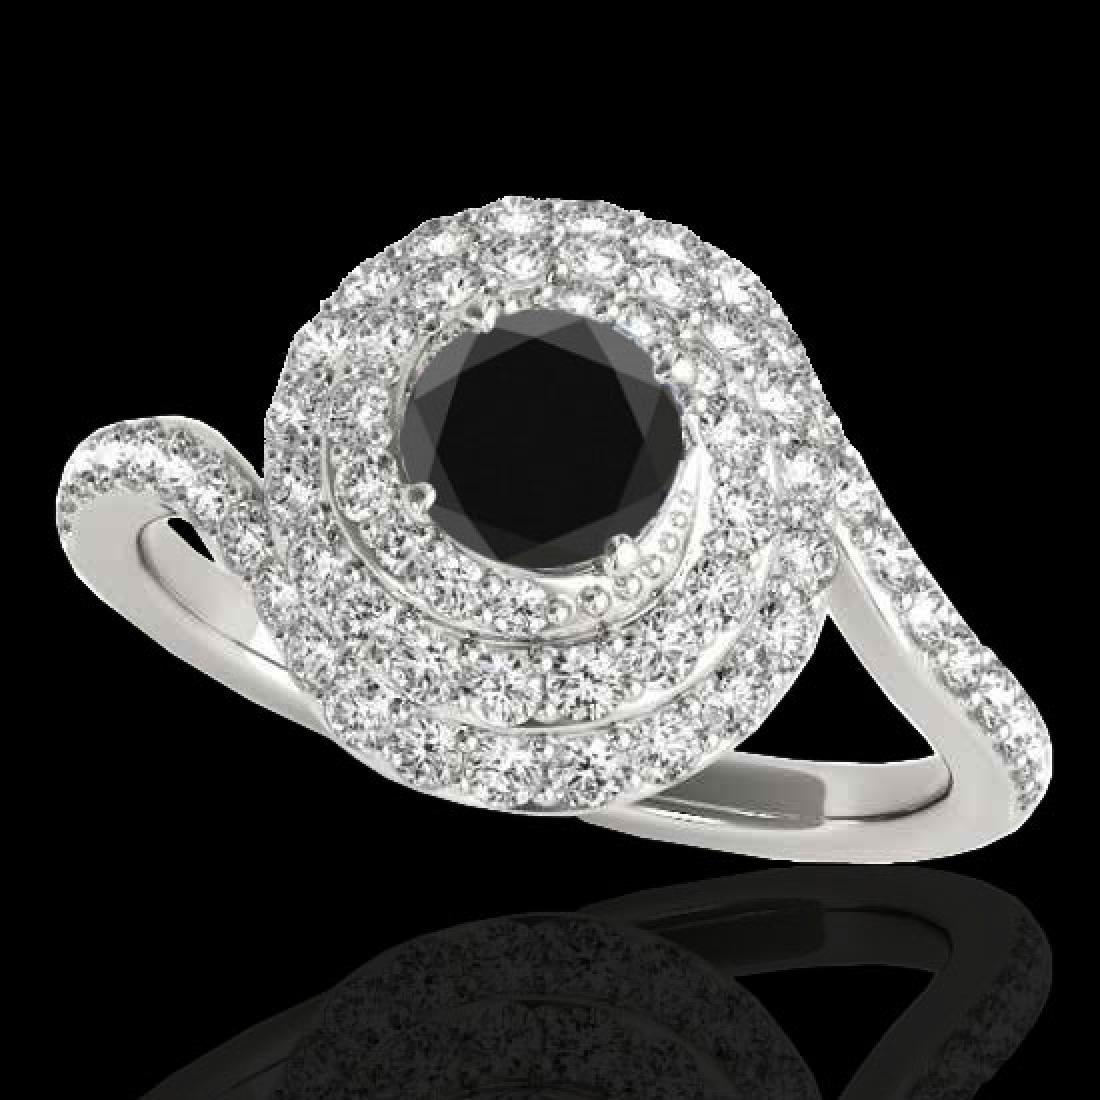 1.86 CTW Certified VS Black Diamond Solitaire Halo Ring